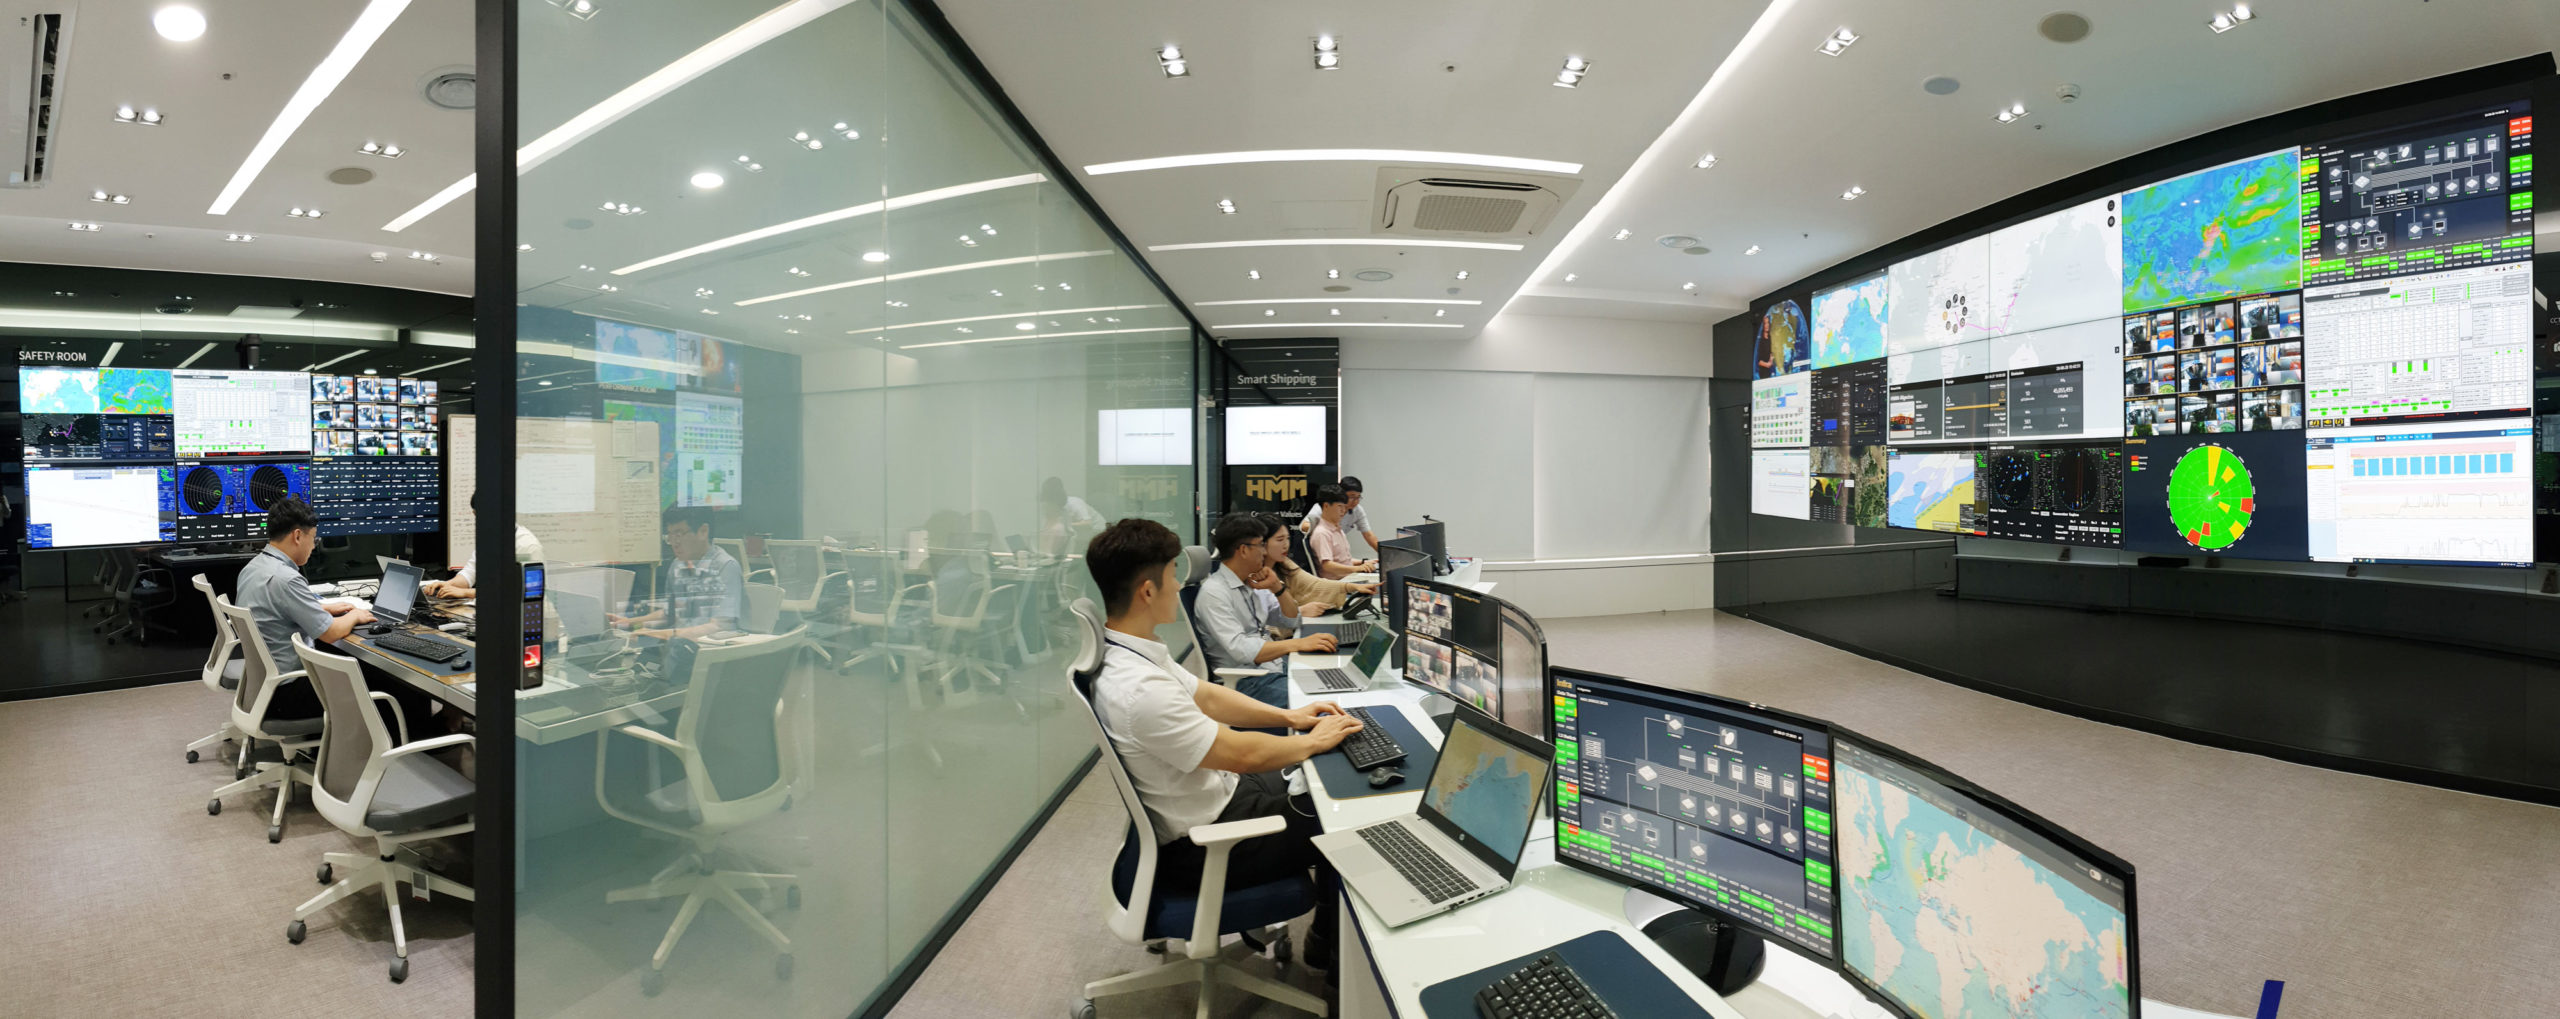 HMM Fleet control centre